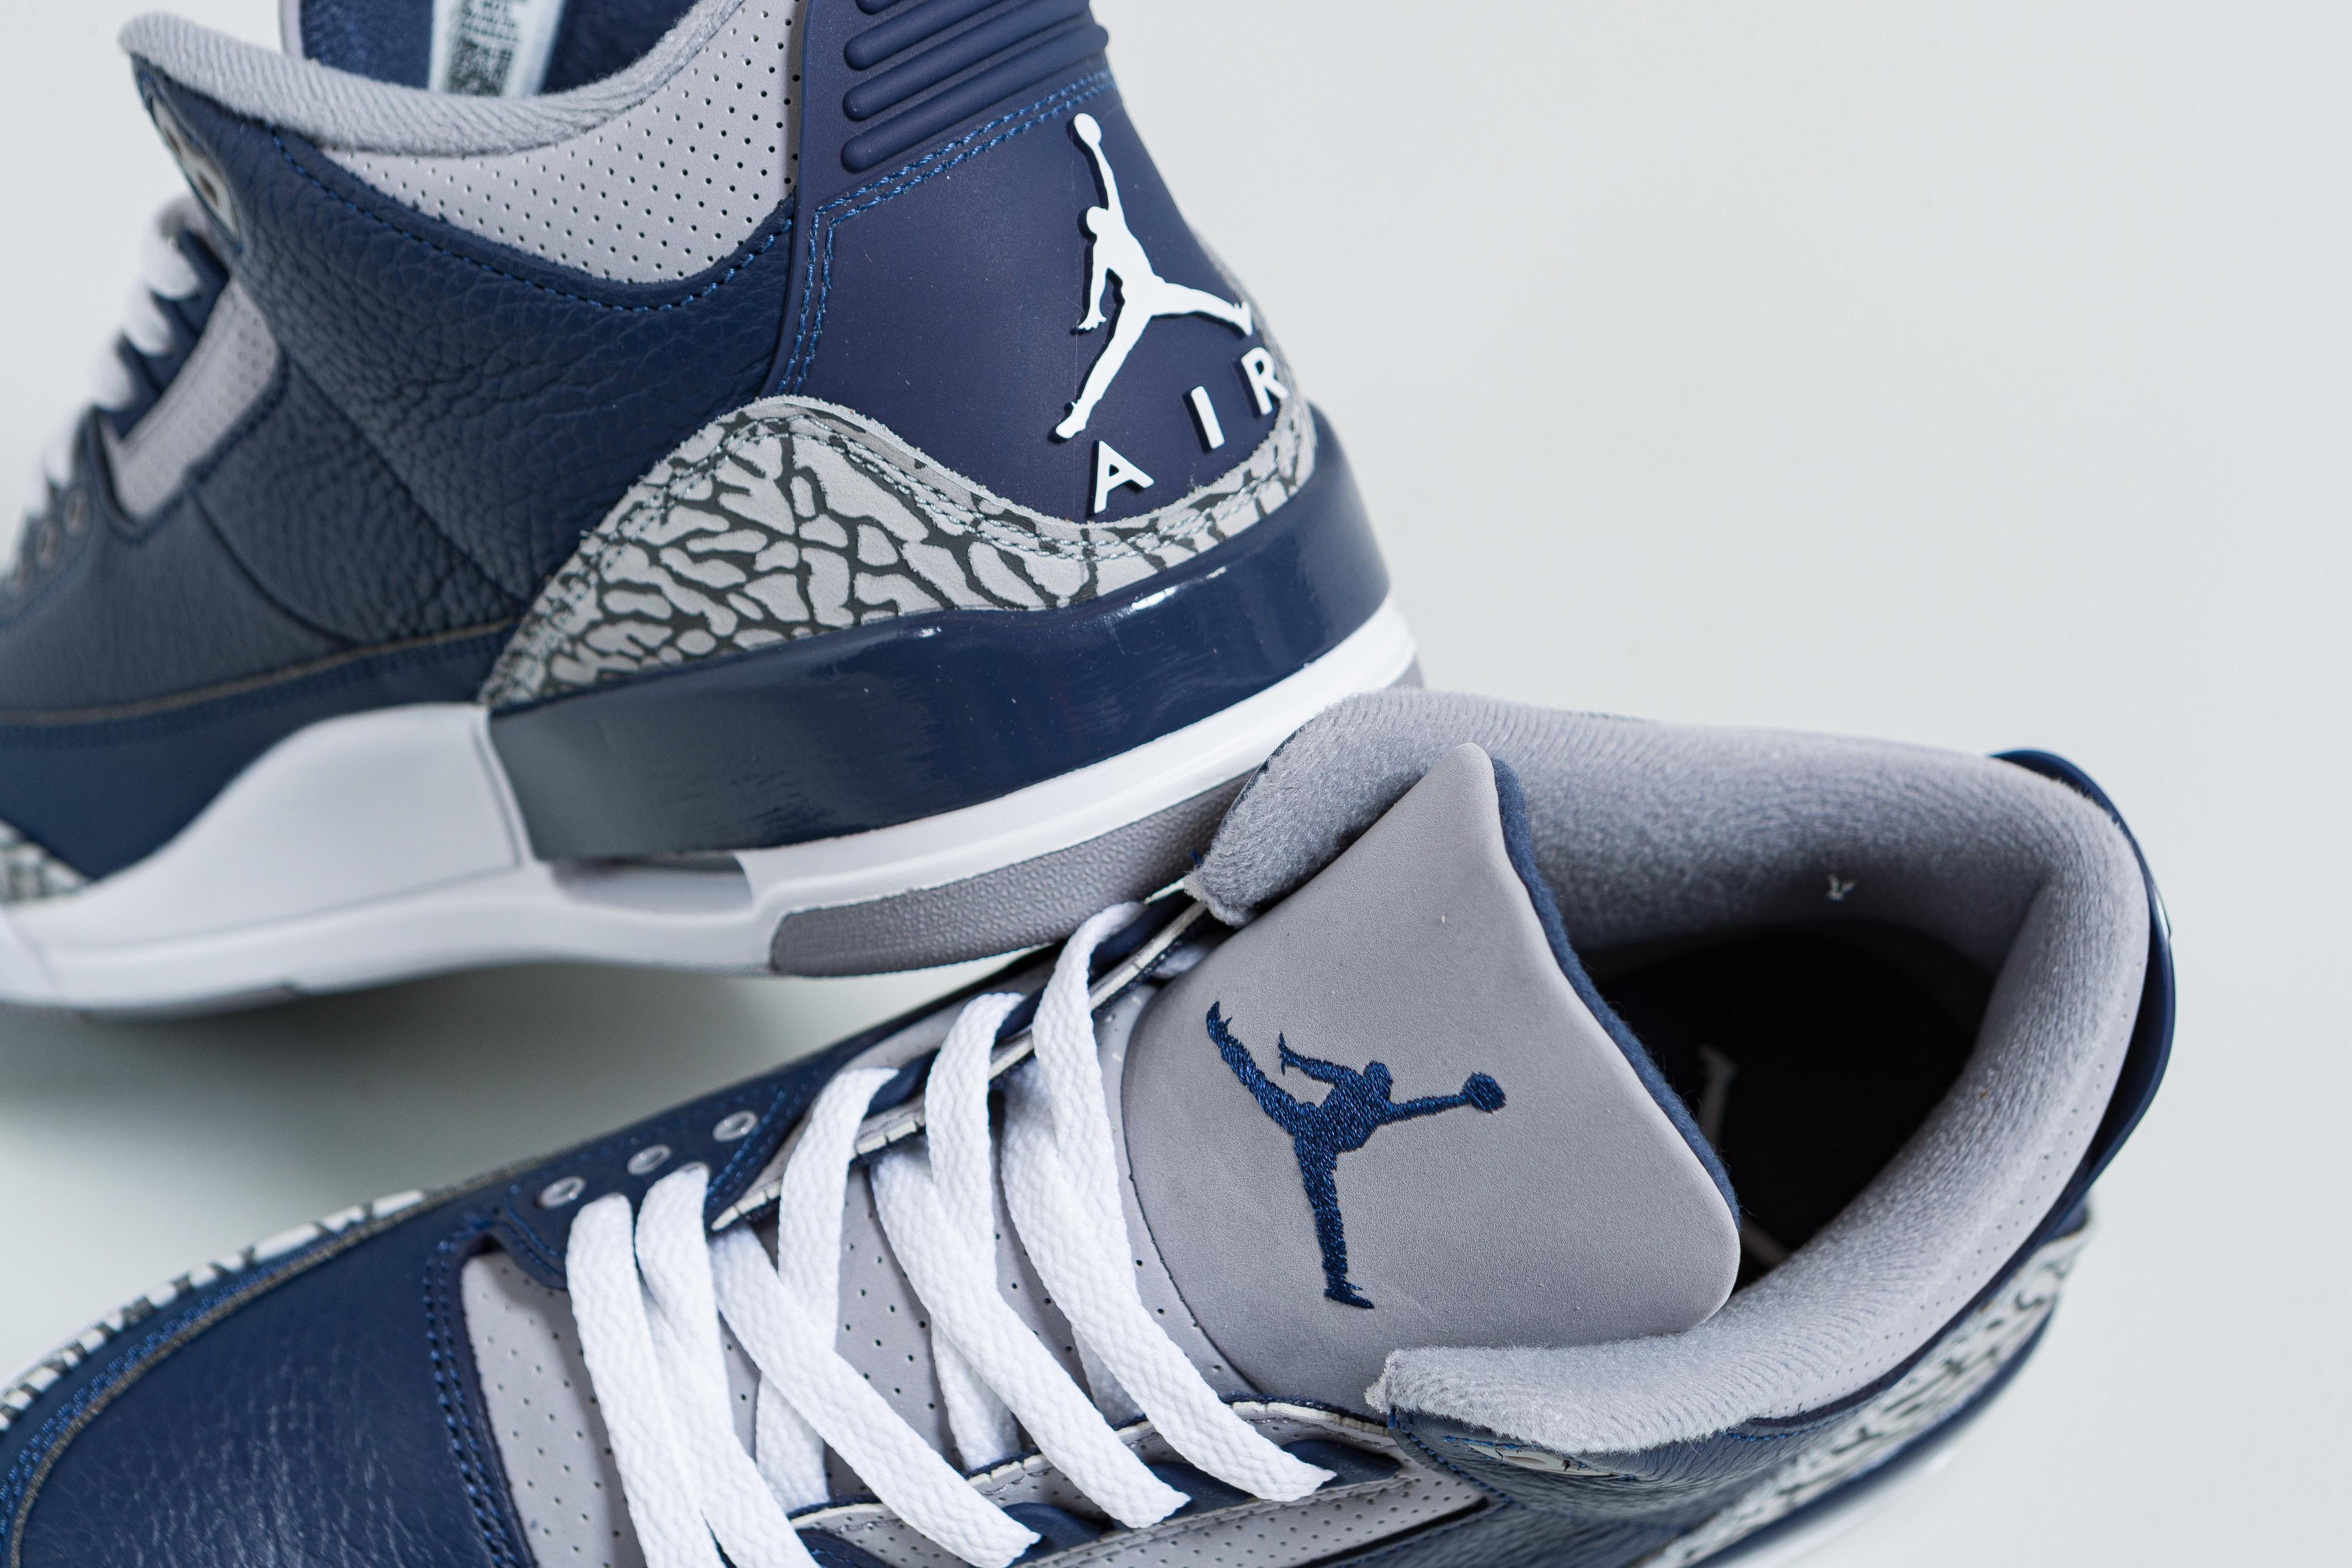 Jordan - Air Jordan 3 Retro - Midnight Navy/White-Cement Grey - Up There